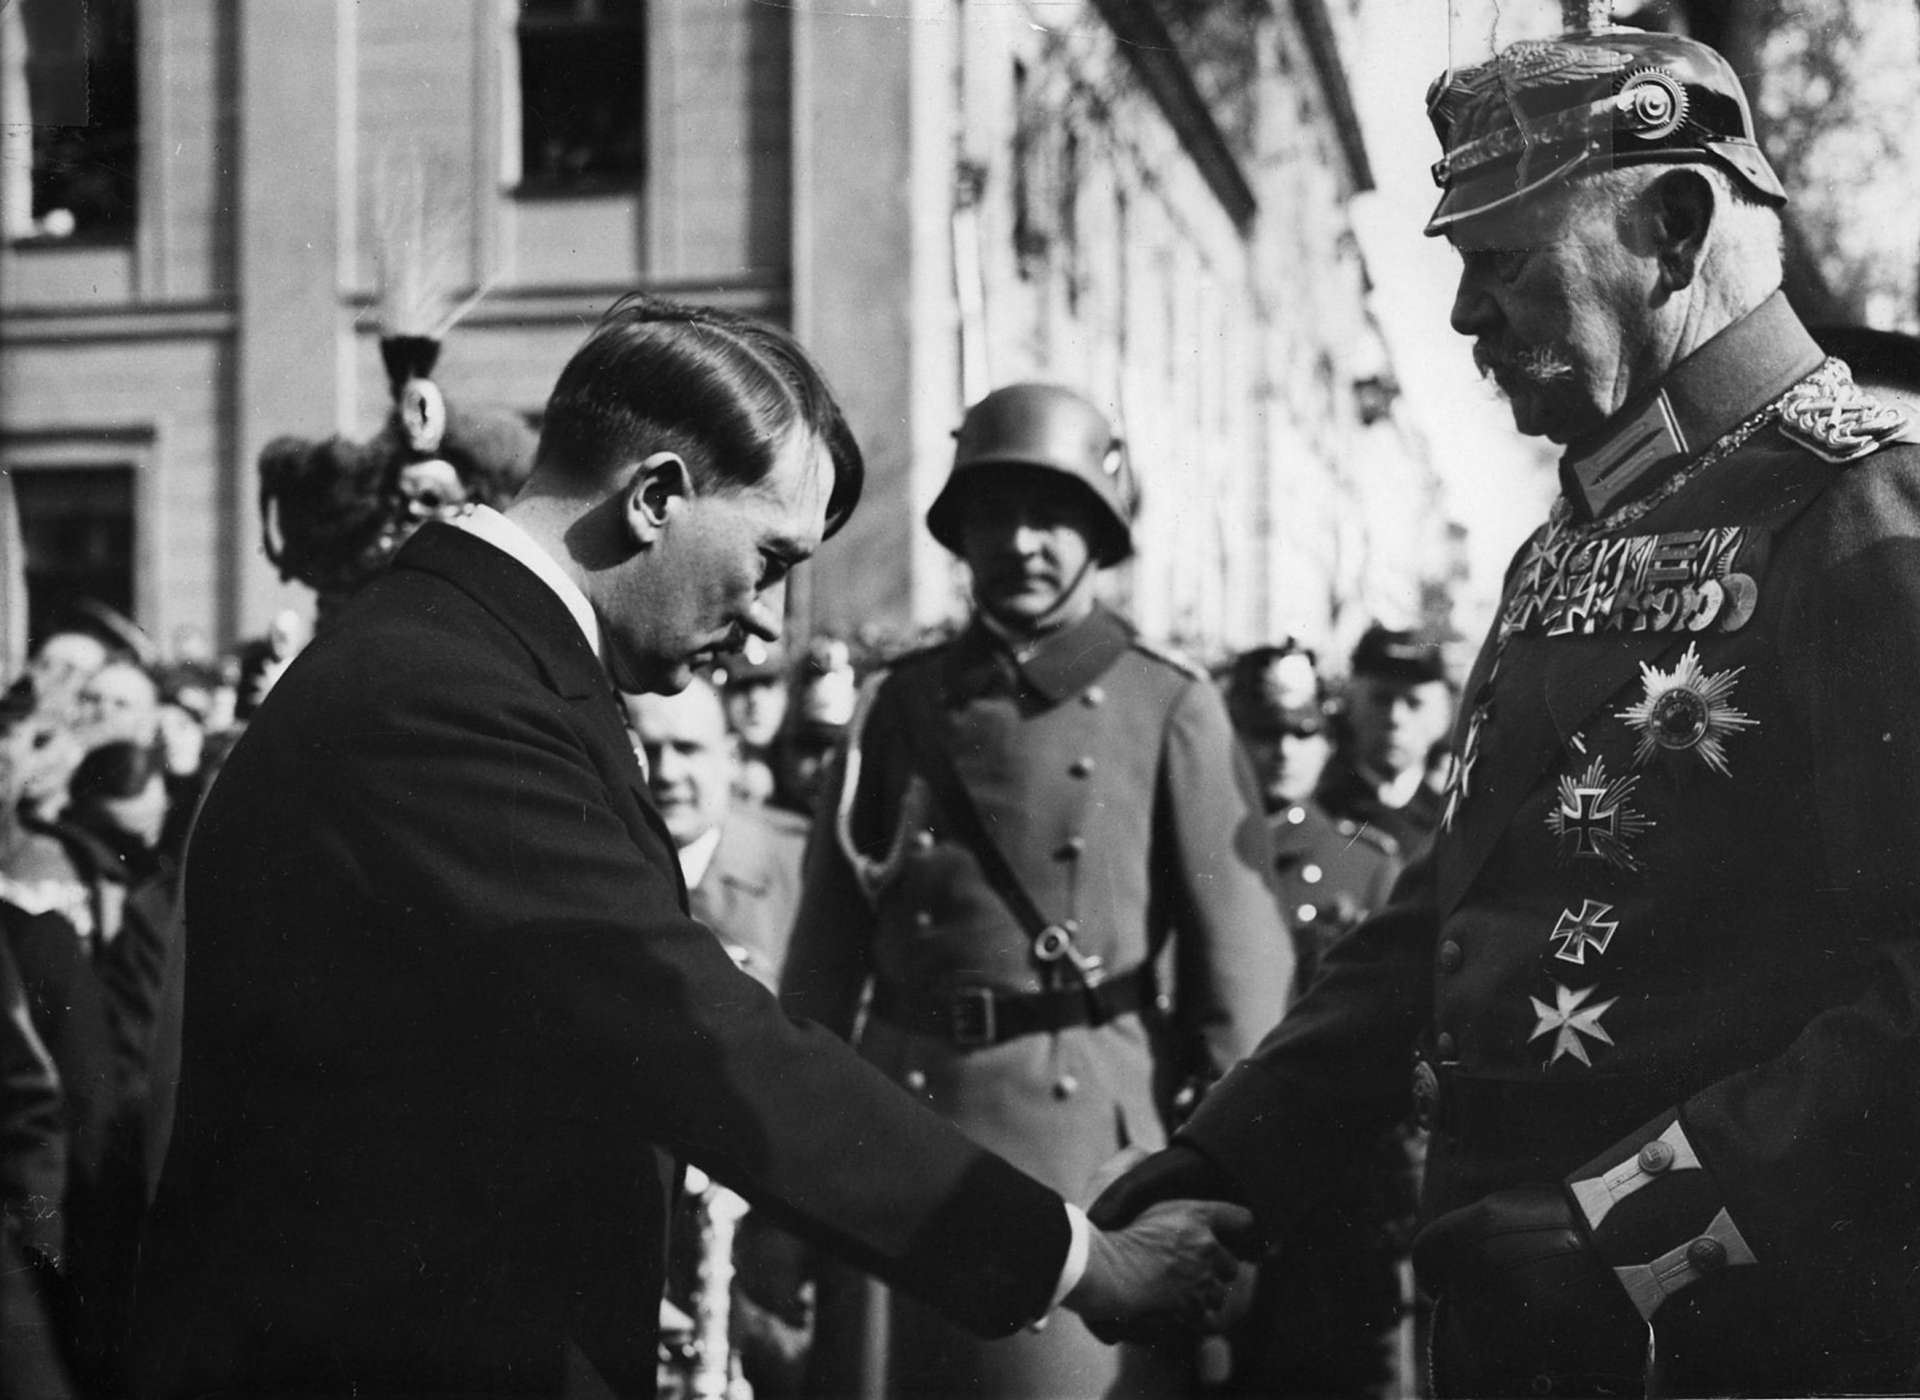 File:Bundesarchiv Bild 183-S38324, Tag von Potsdam, Adolf Hitler, Paul v. Hindenburg.jpg